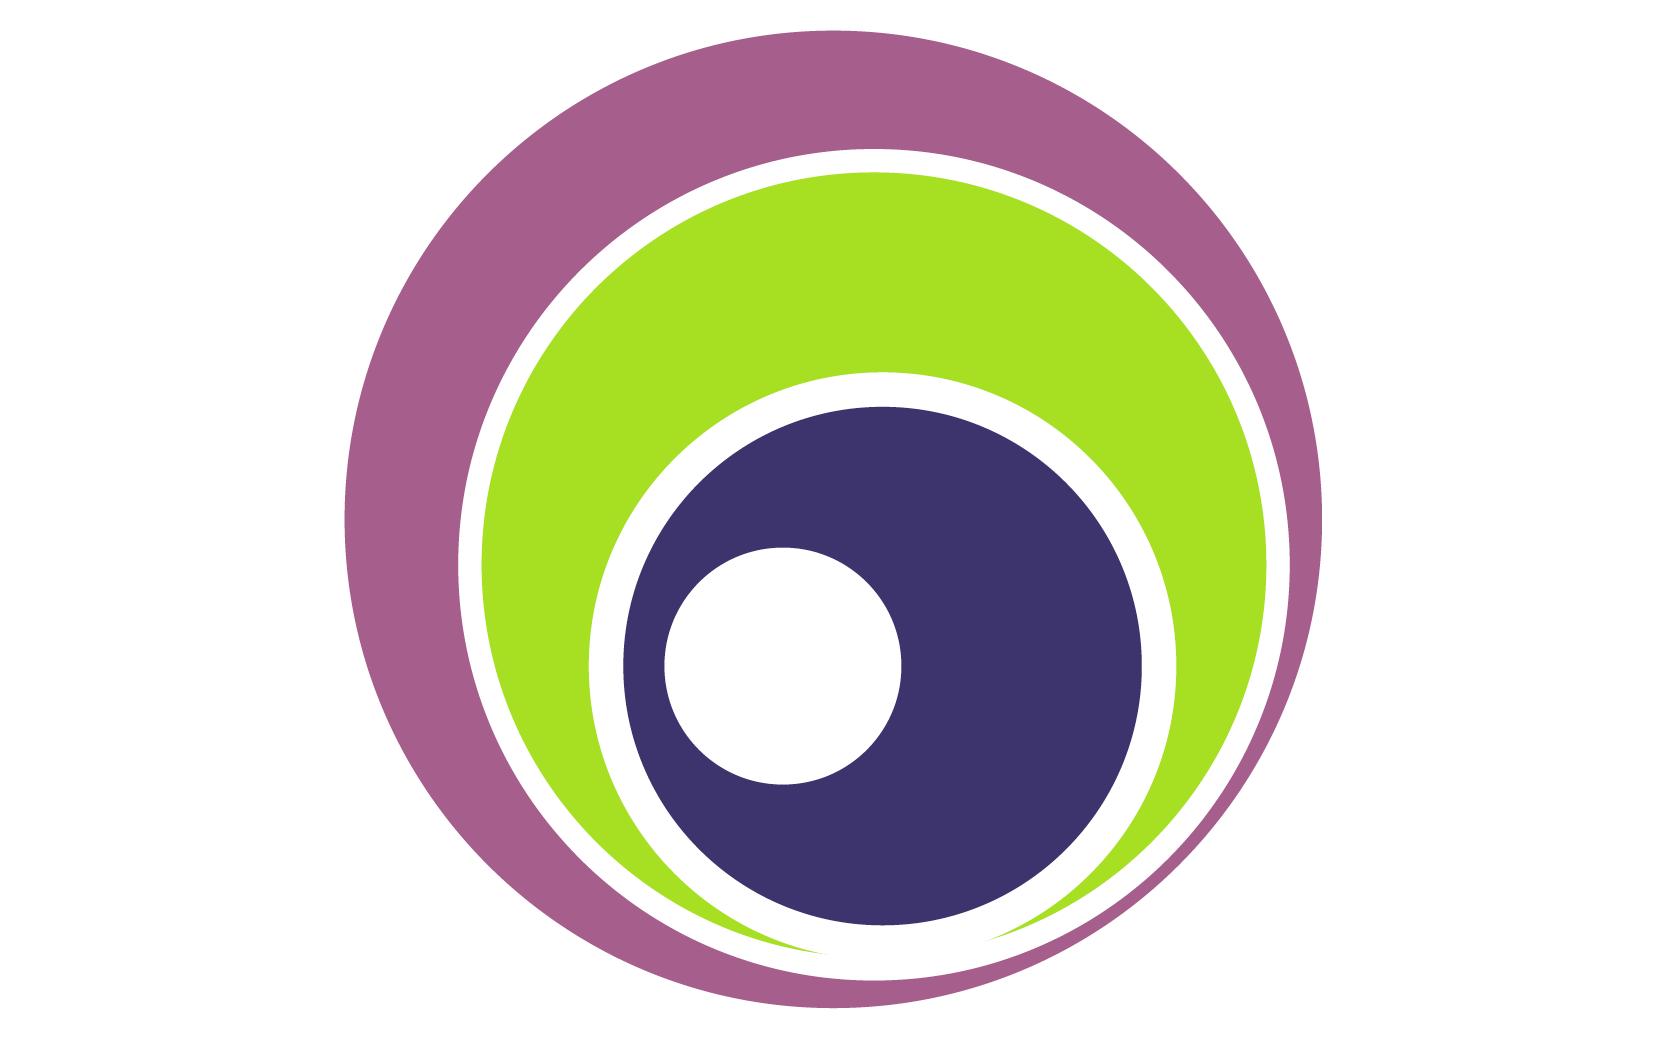 rond-violet-vert-au-plaisir-du-jardin-service